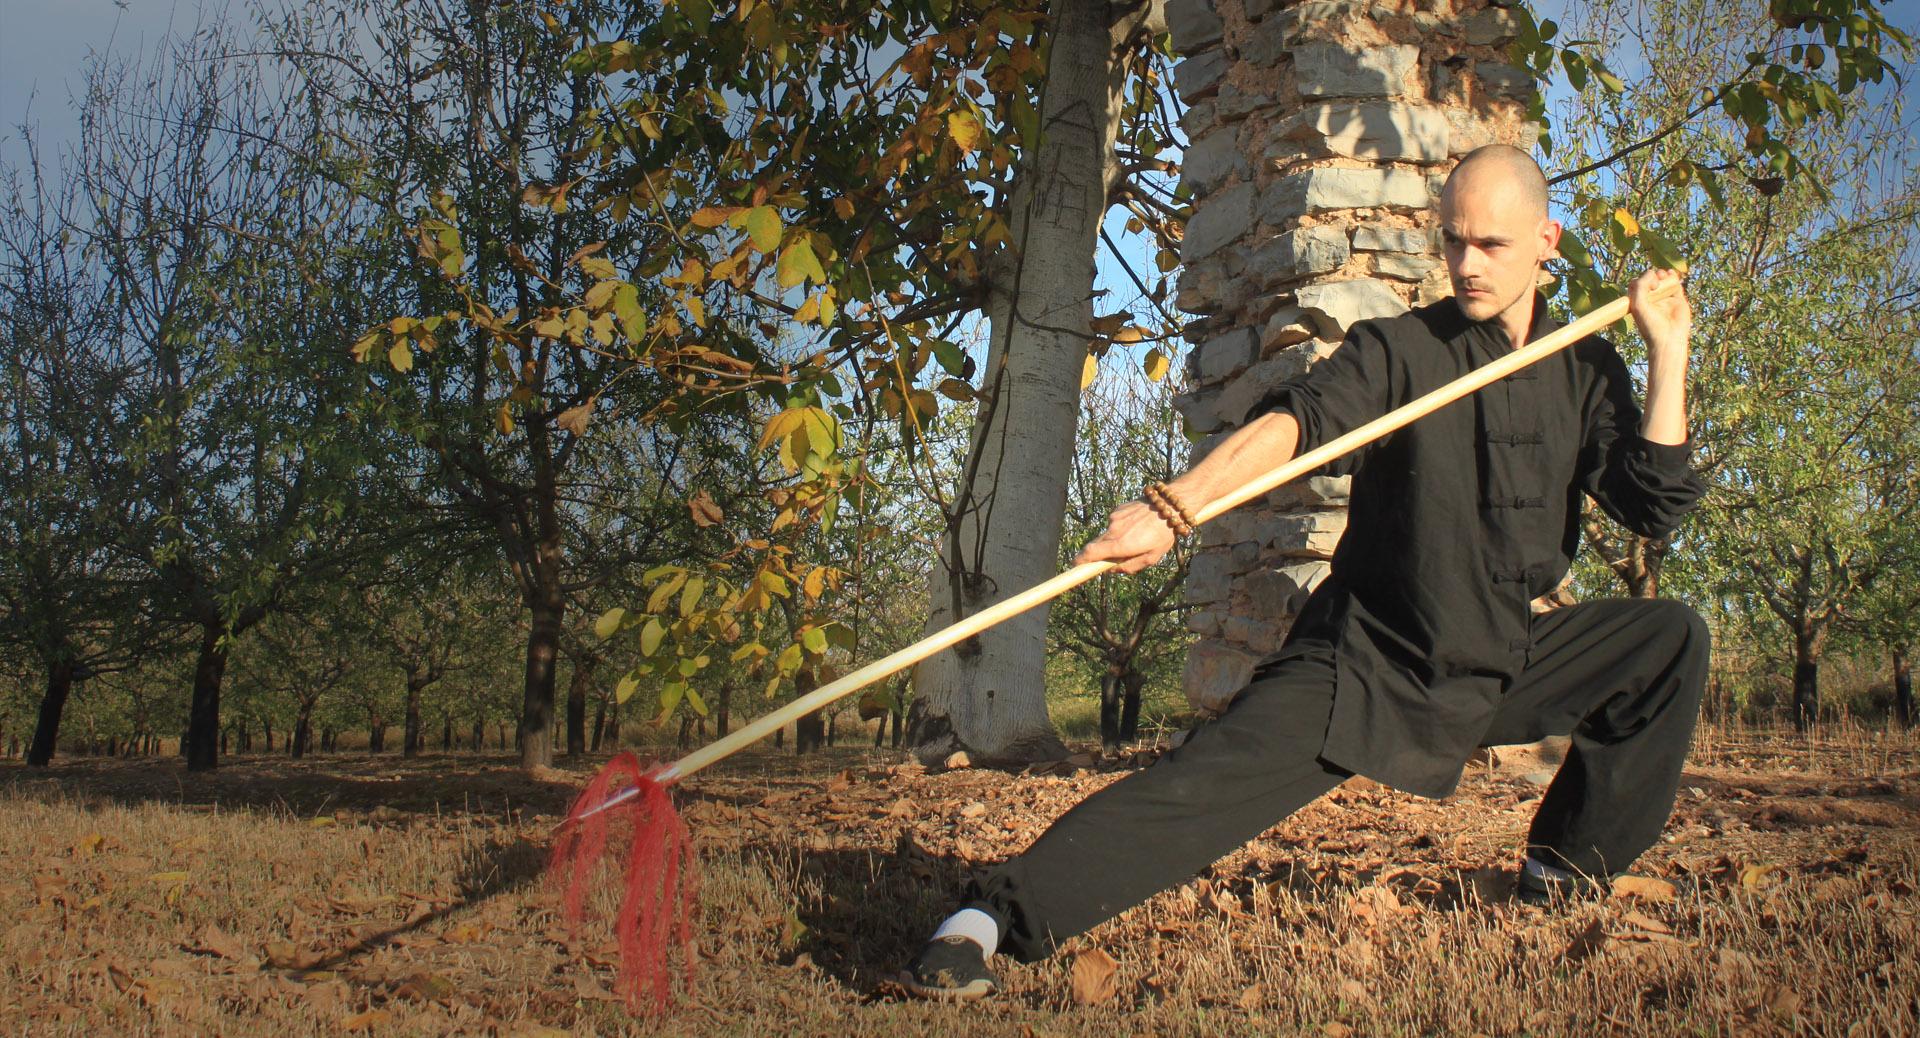 Clases de Kung Fu Choy Li Fut Zaragoza - Disciplinas